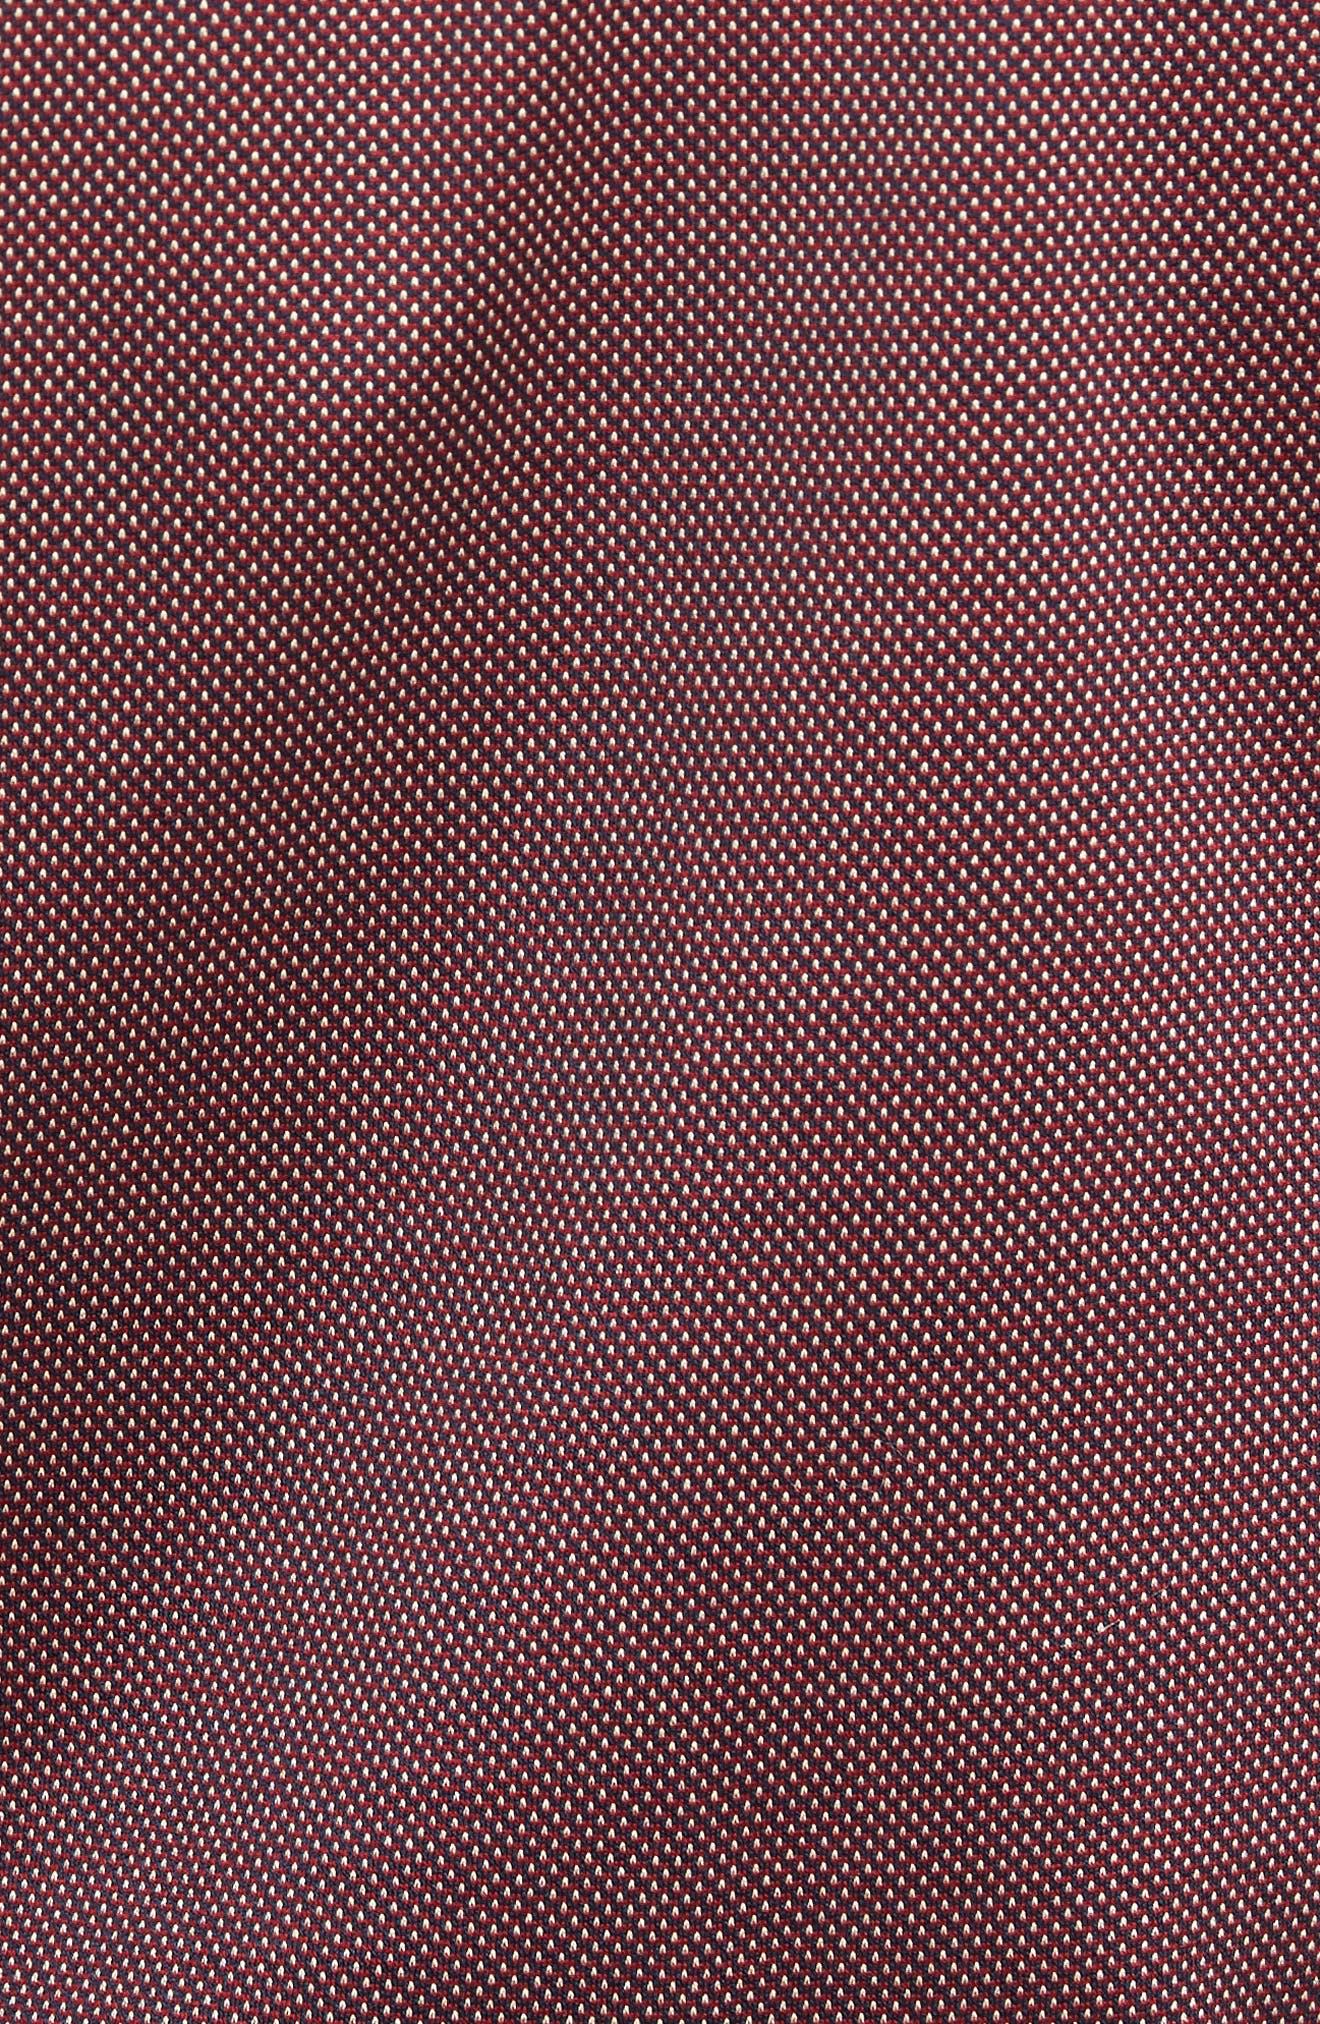 Verde Jacquard Mercerized Cotton Polo,                             Alternate thumbnail 5, color,                             Brick Red